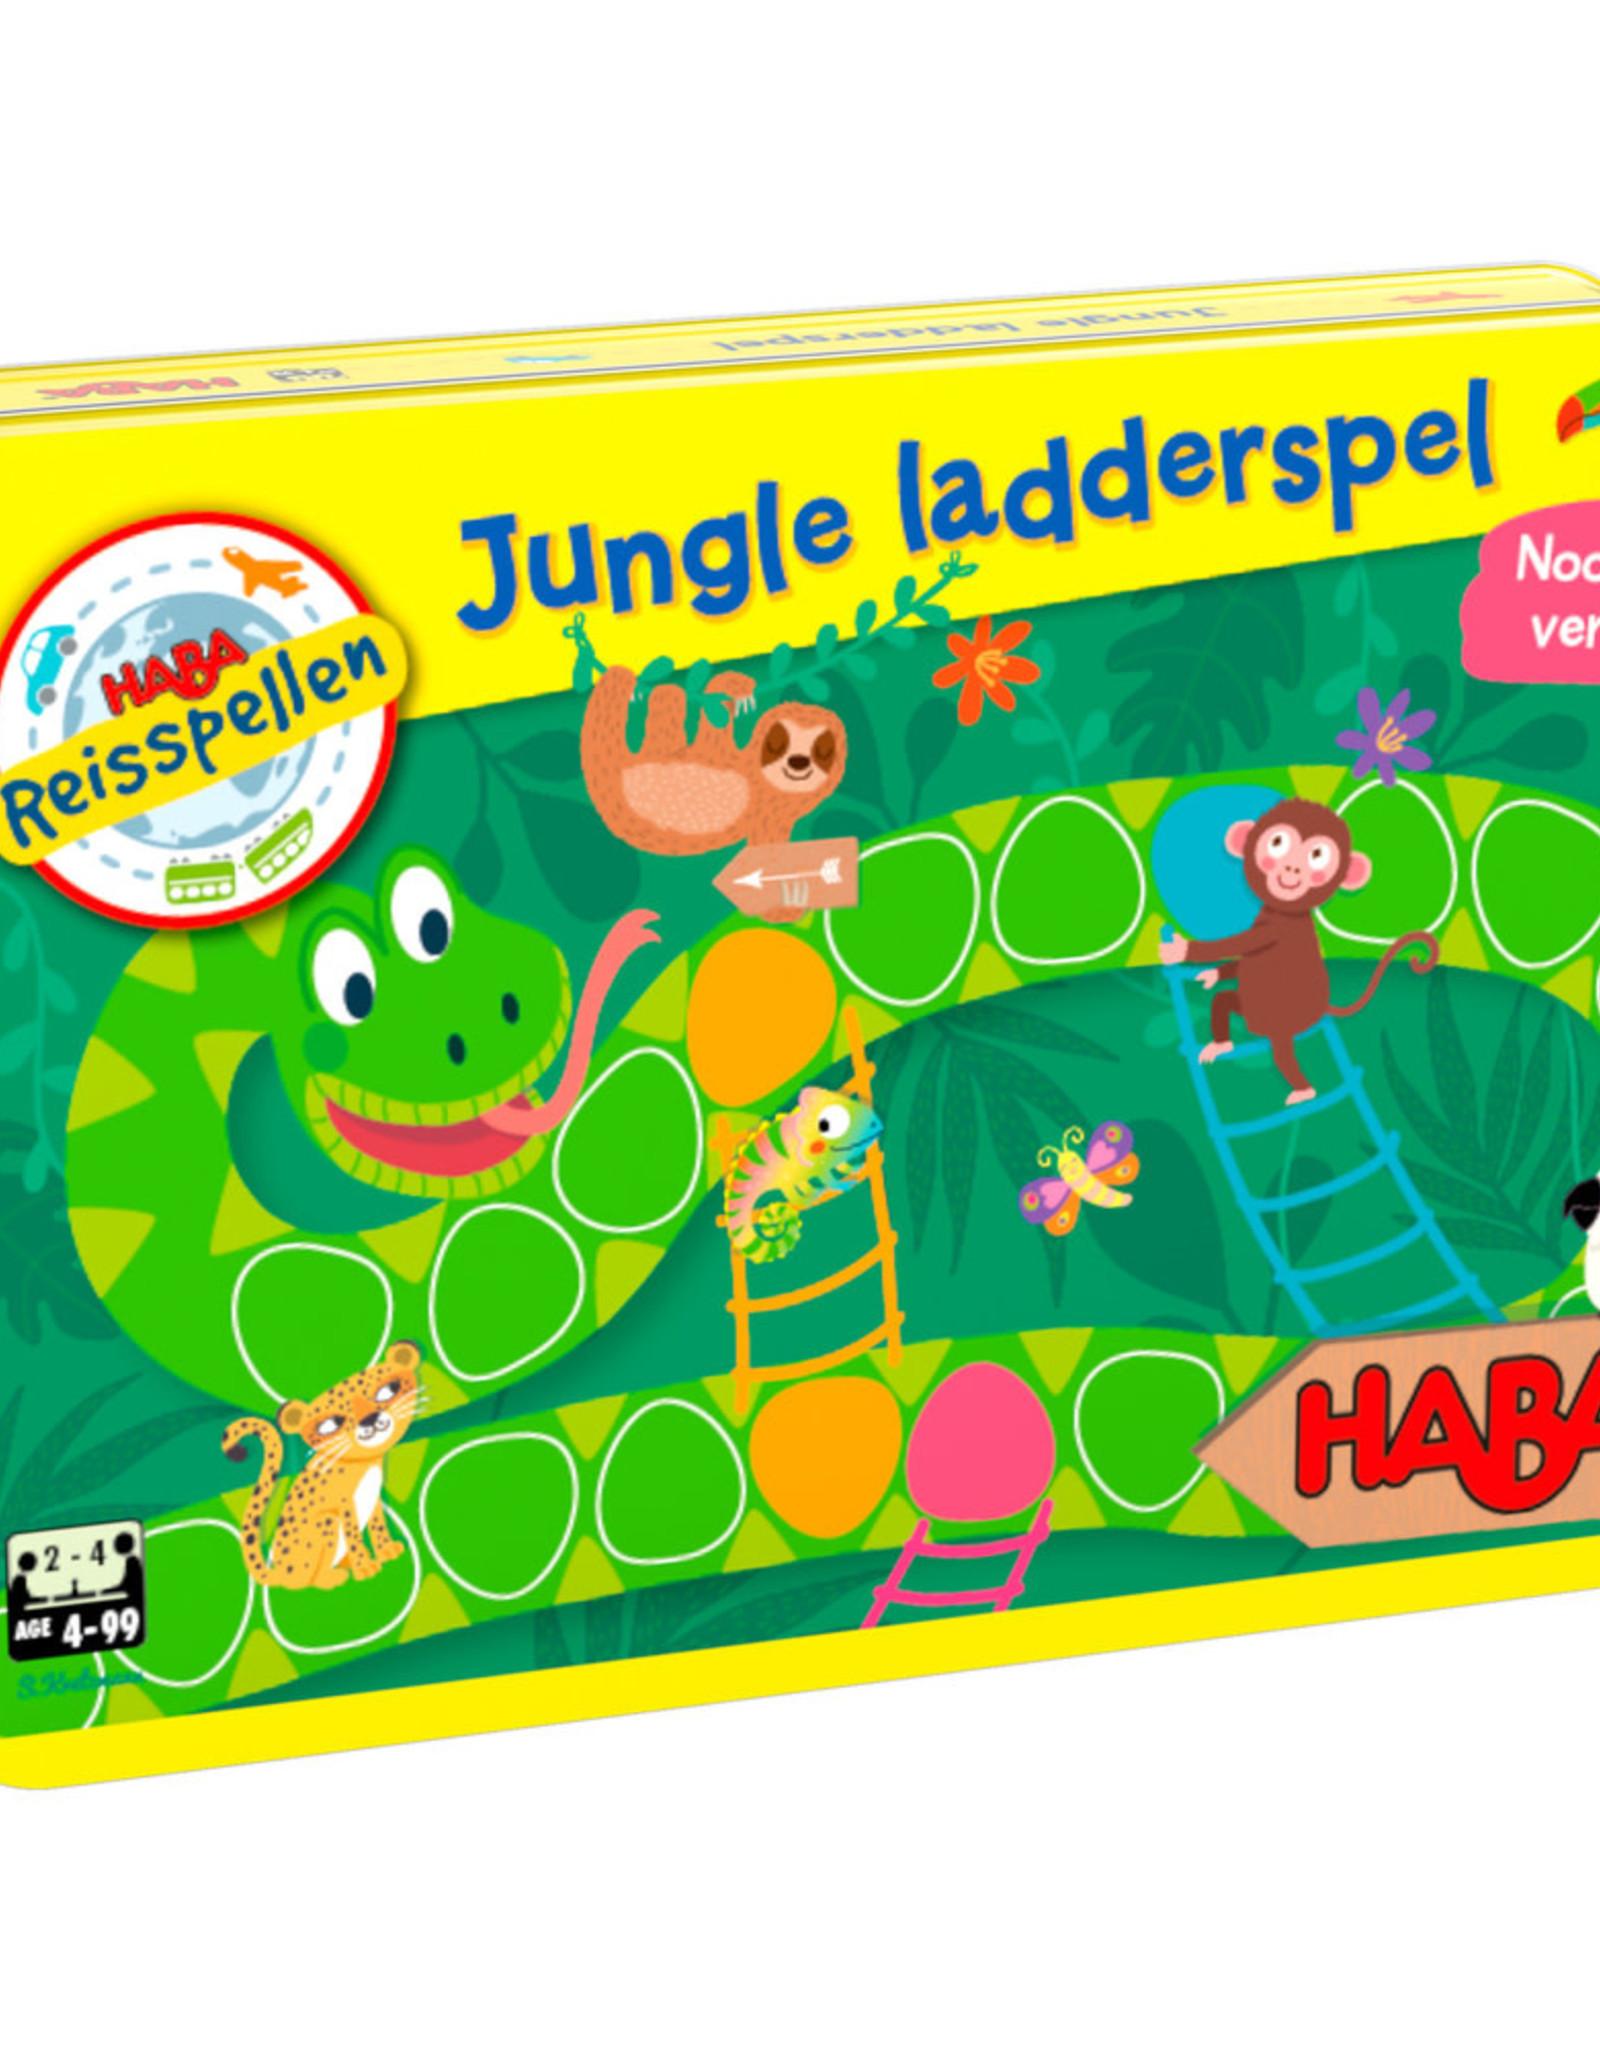 HABA Jungle ladderspel